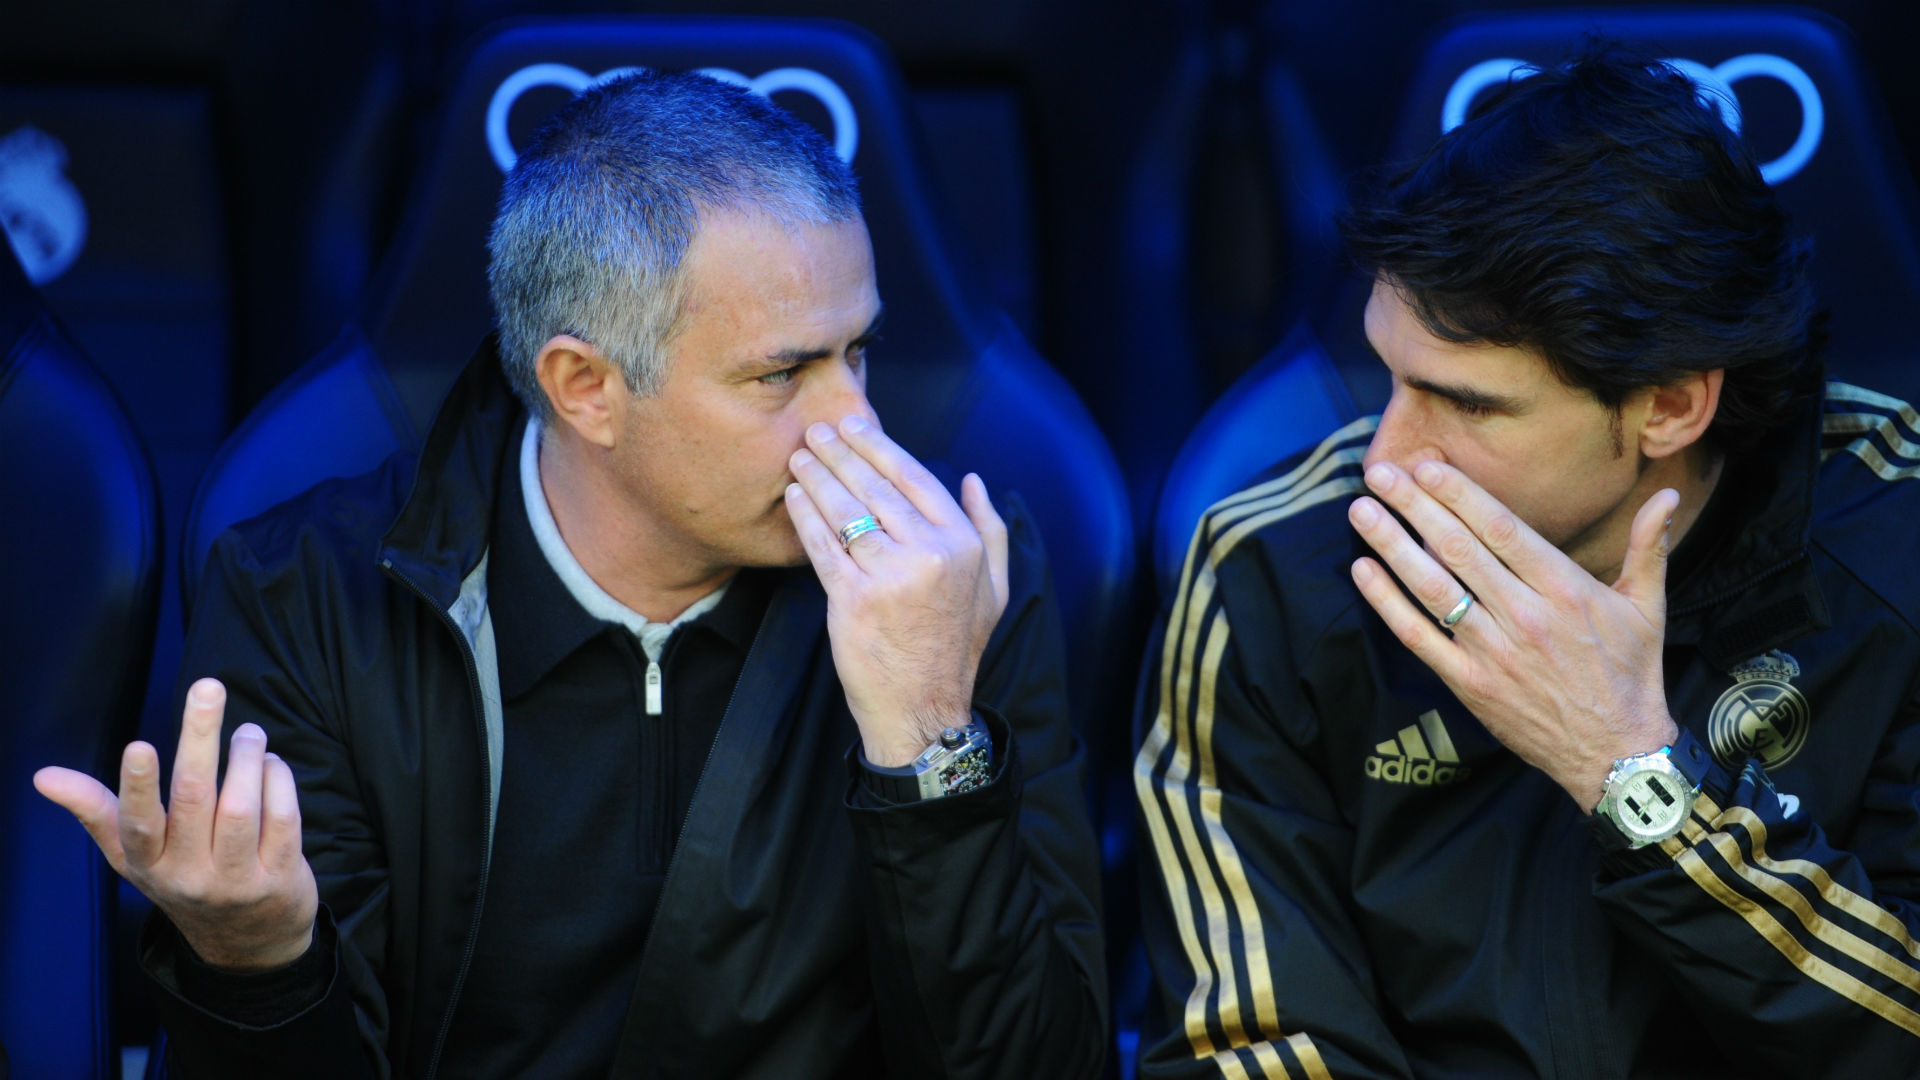 Jose Mourinho Aitor Karanka Real Madrid